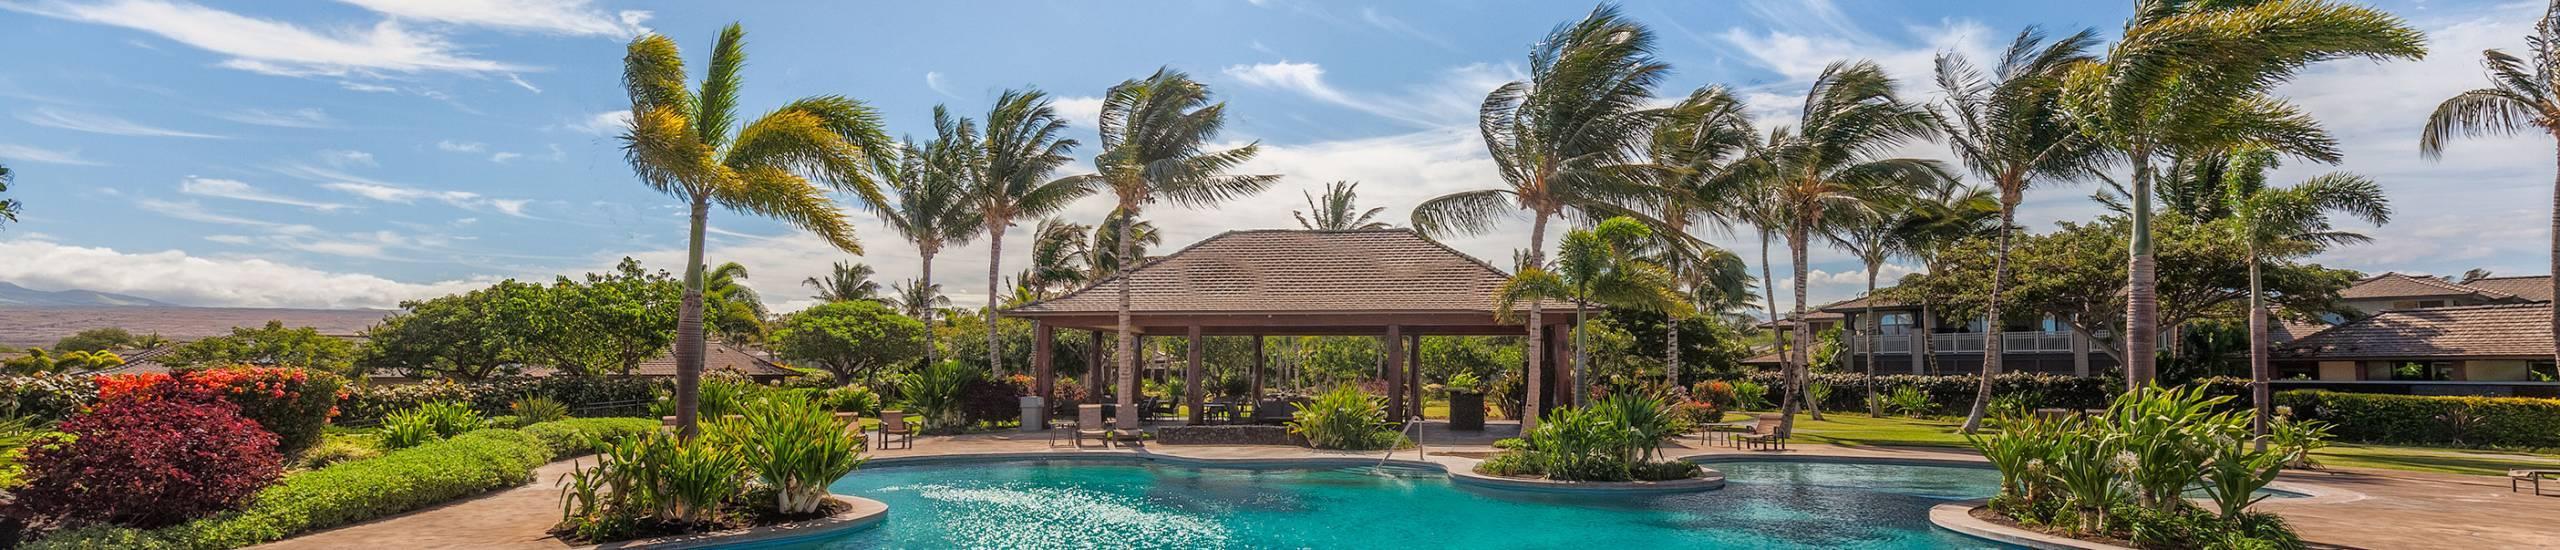 Family pool at KaMilo at Mauna Lani Resort on the Big Island